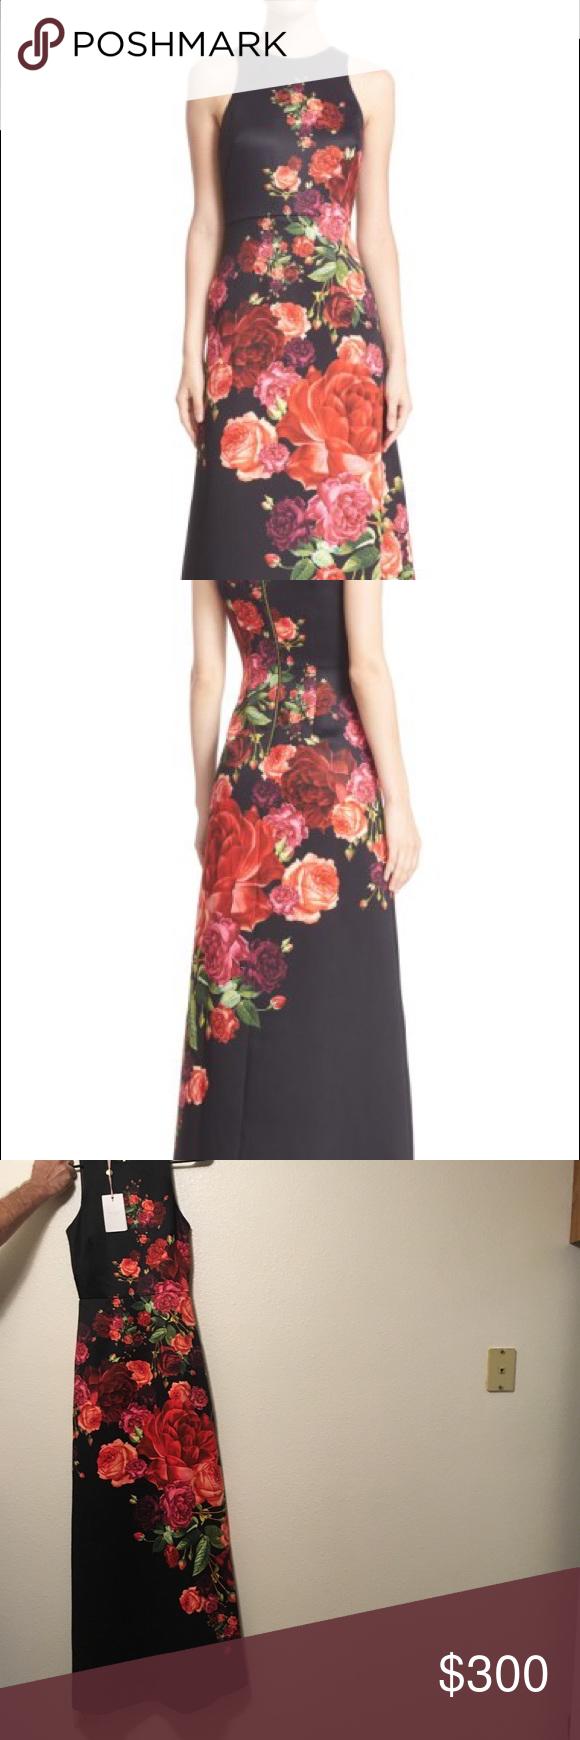 0d3e67a3fc9fd Ted Baker Juxtapose Rose Marico Maxi Dress 0 US 2 Set against a dark canvas